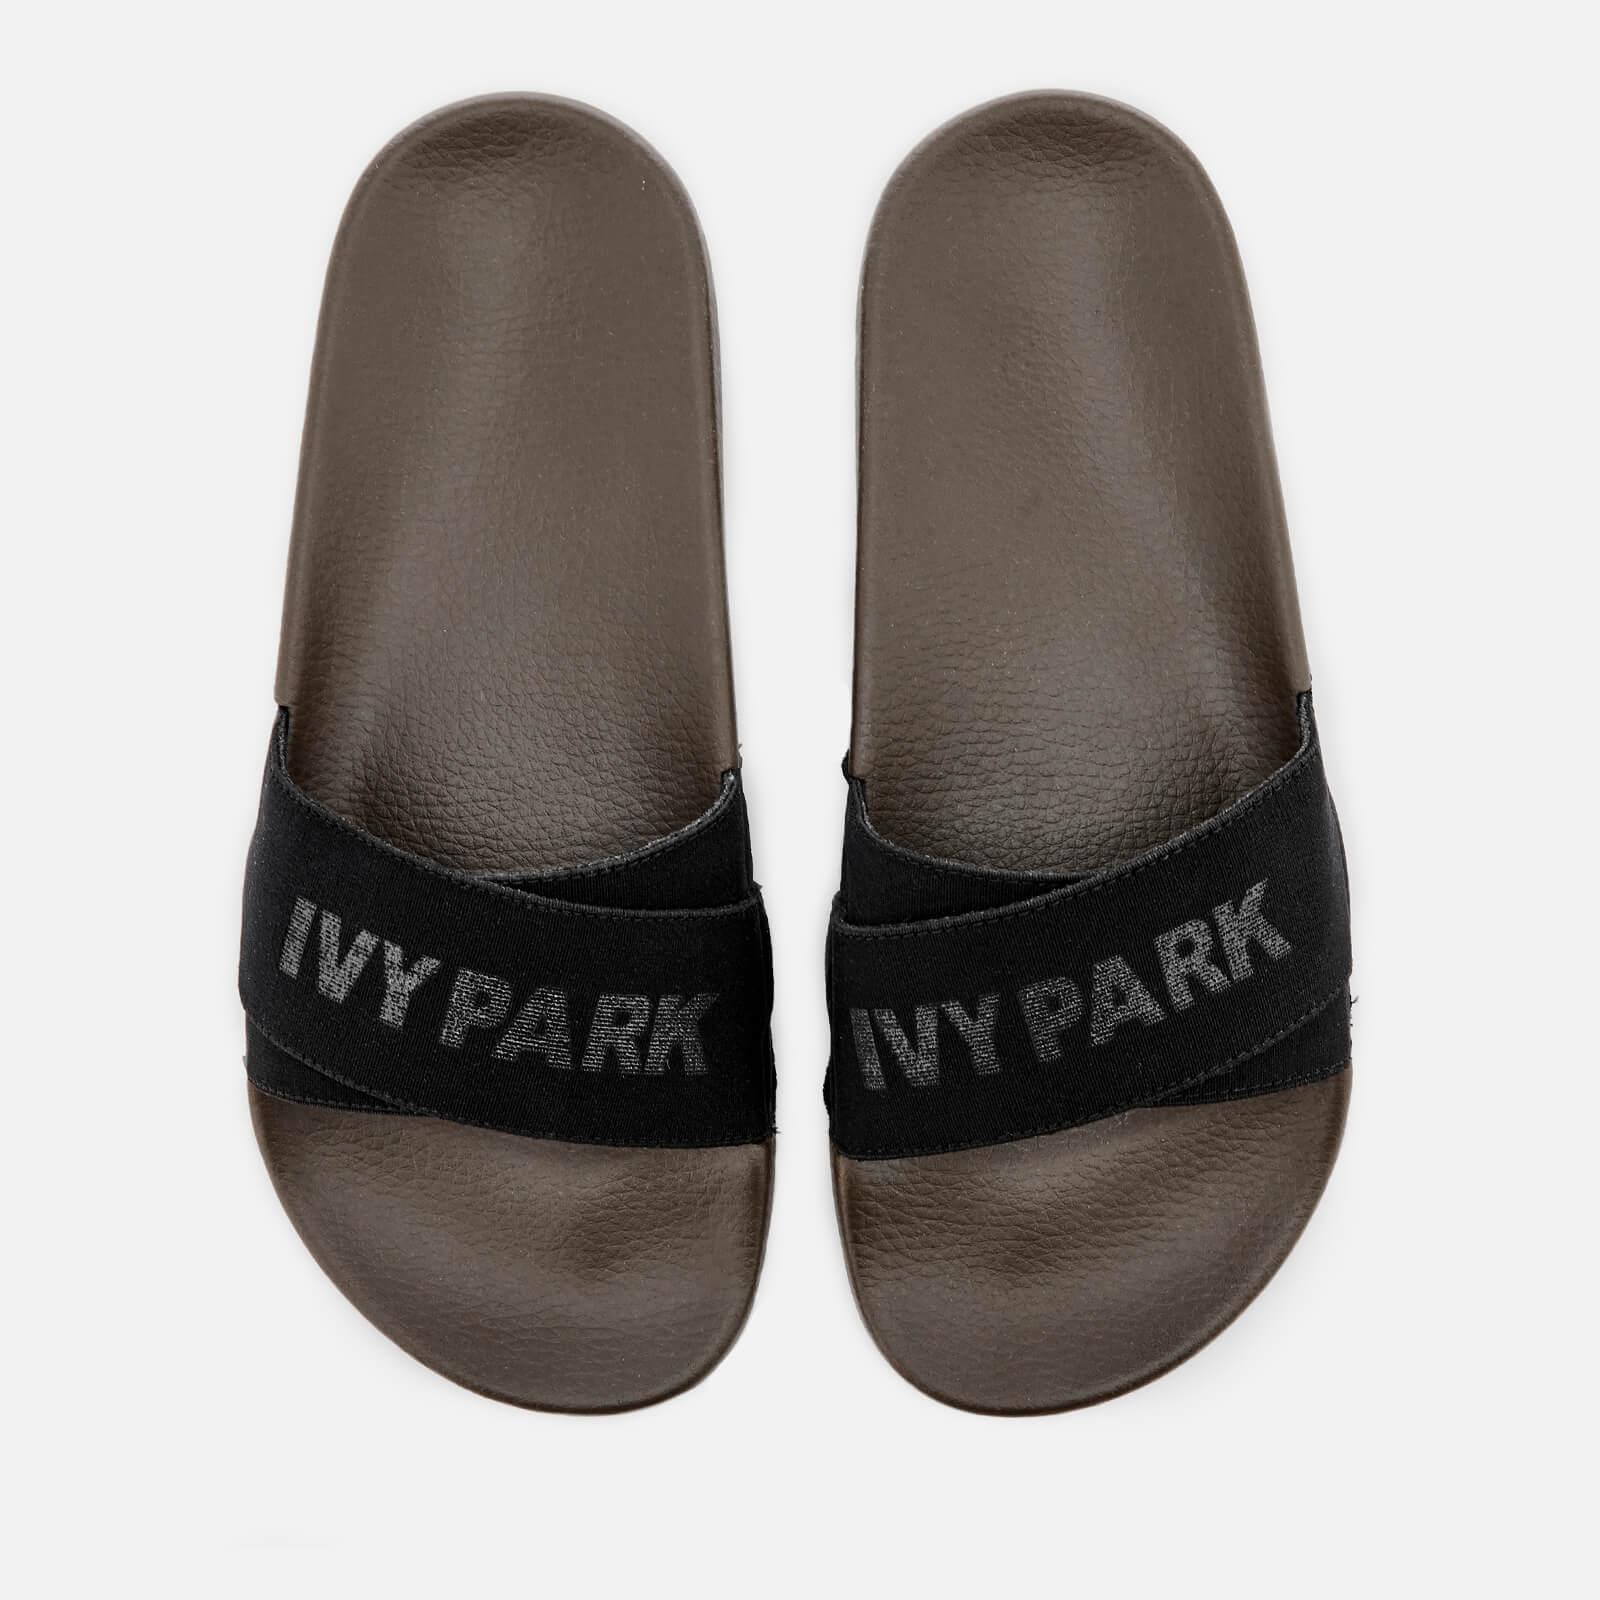 3cb78f8b0bbd Ivy Park Women s Logo Tape Slide Sandals - Crocodile Sports   Leisure